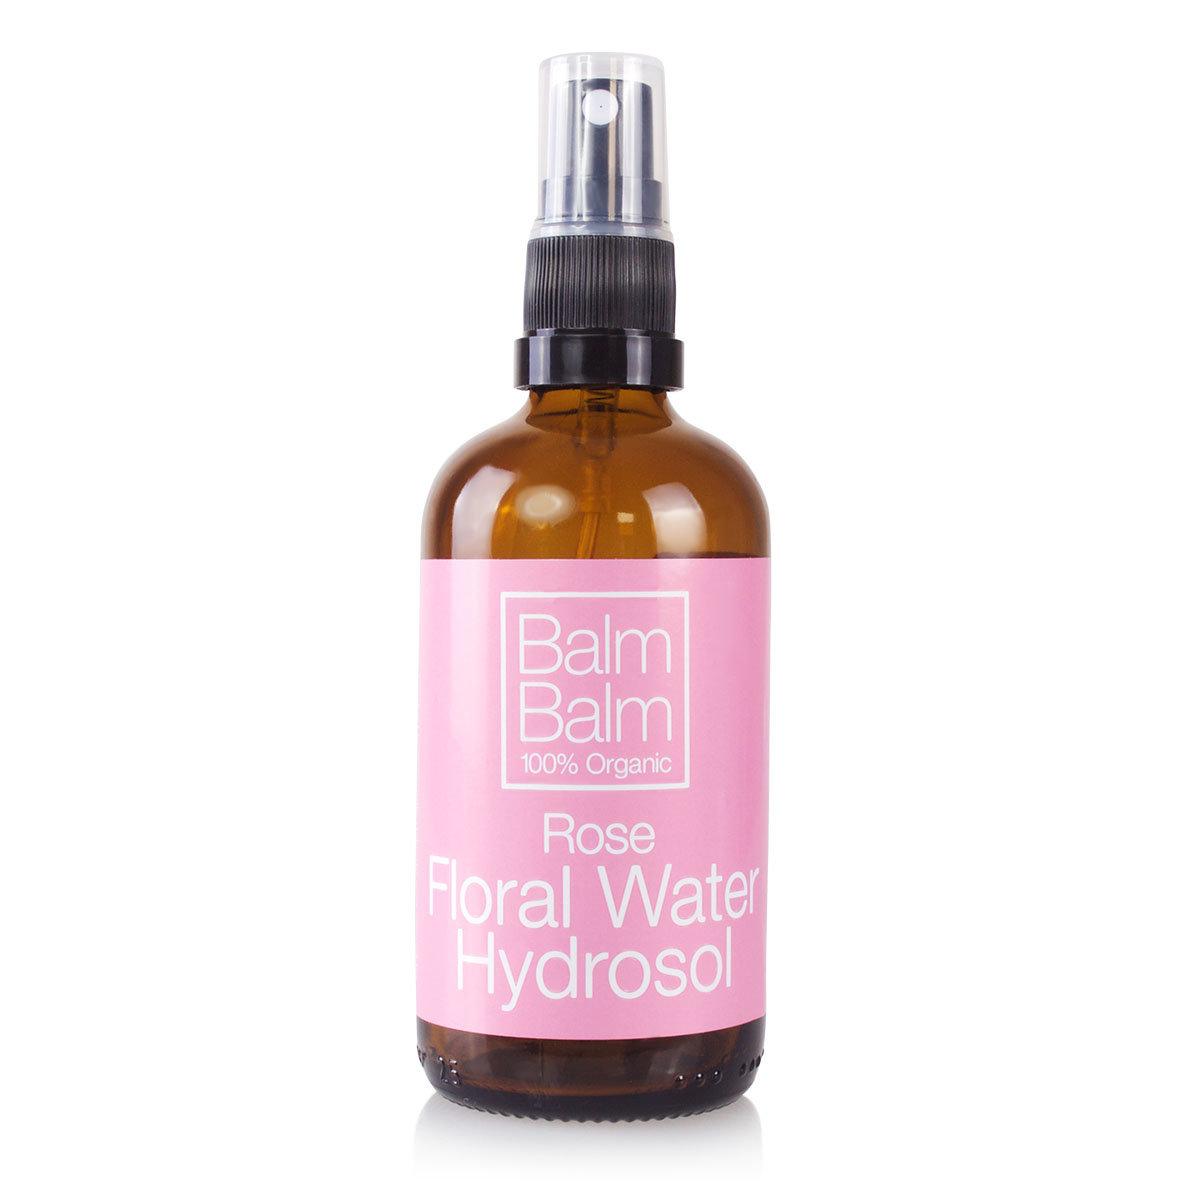 Rose Floral Water Hydrosol